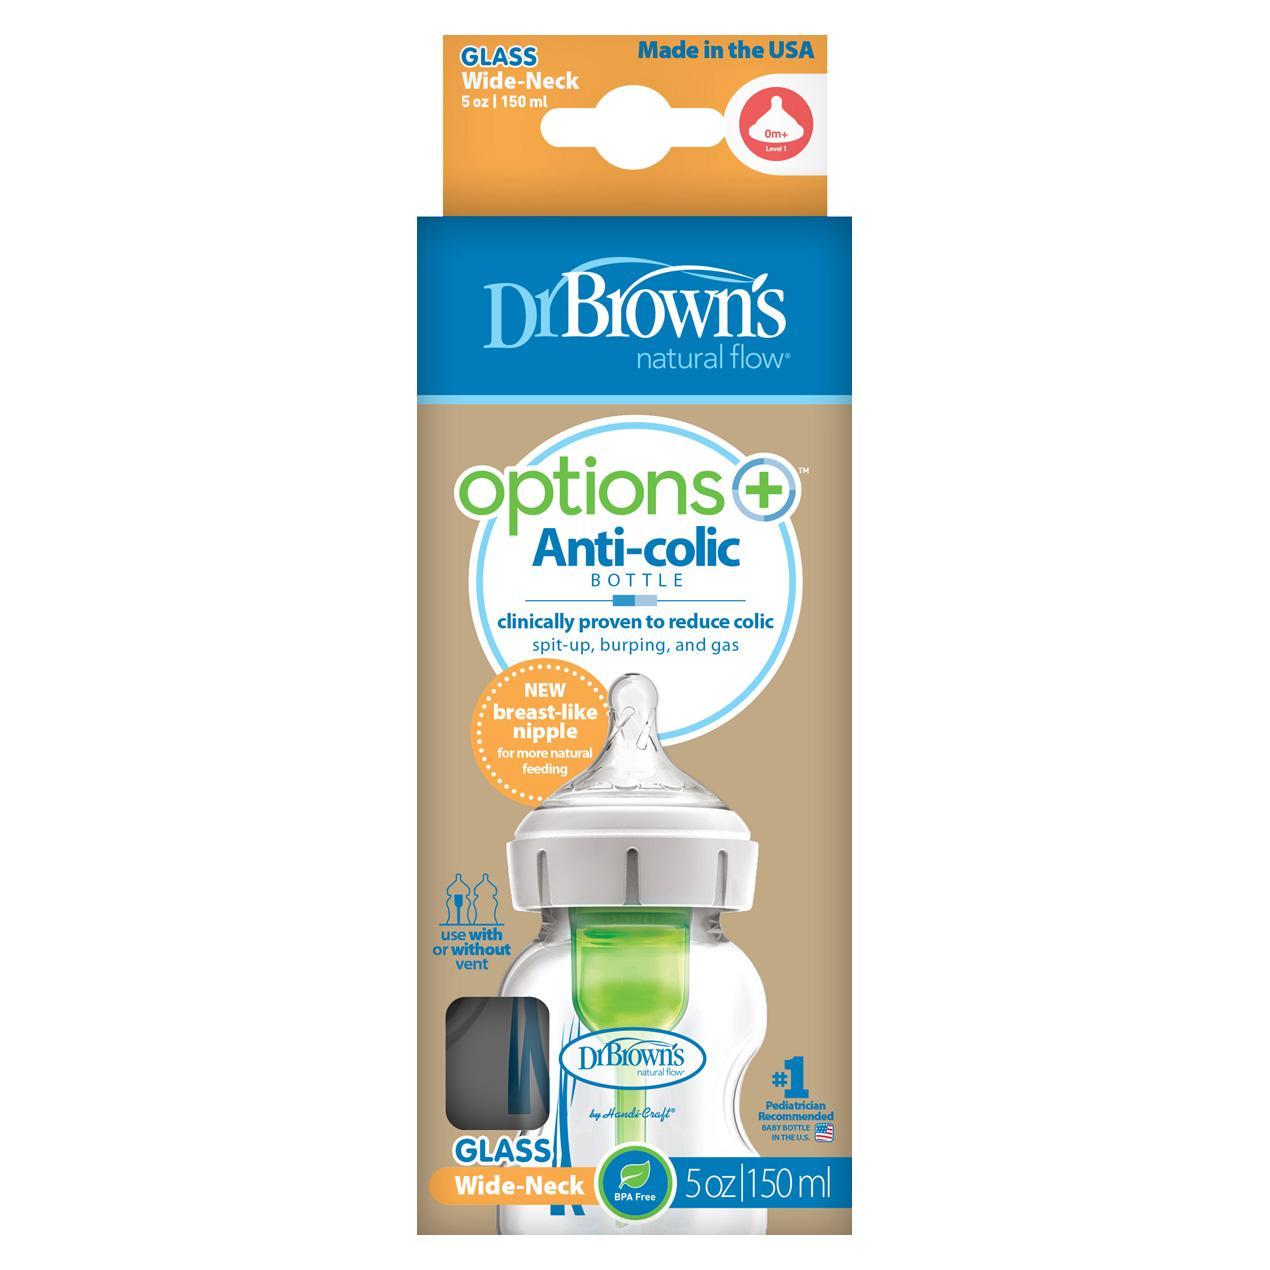 Dr.Brown´s Natural Flow Options+ Anti-colic Wide-Neck Glass Baby Bottle kojenecká láhev 150 ml